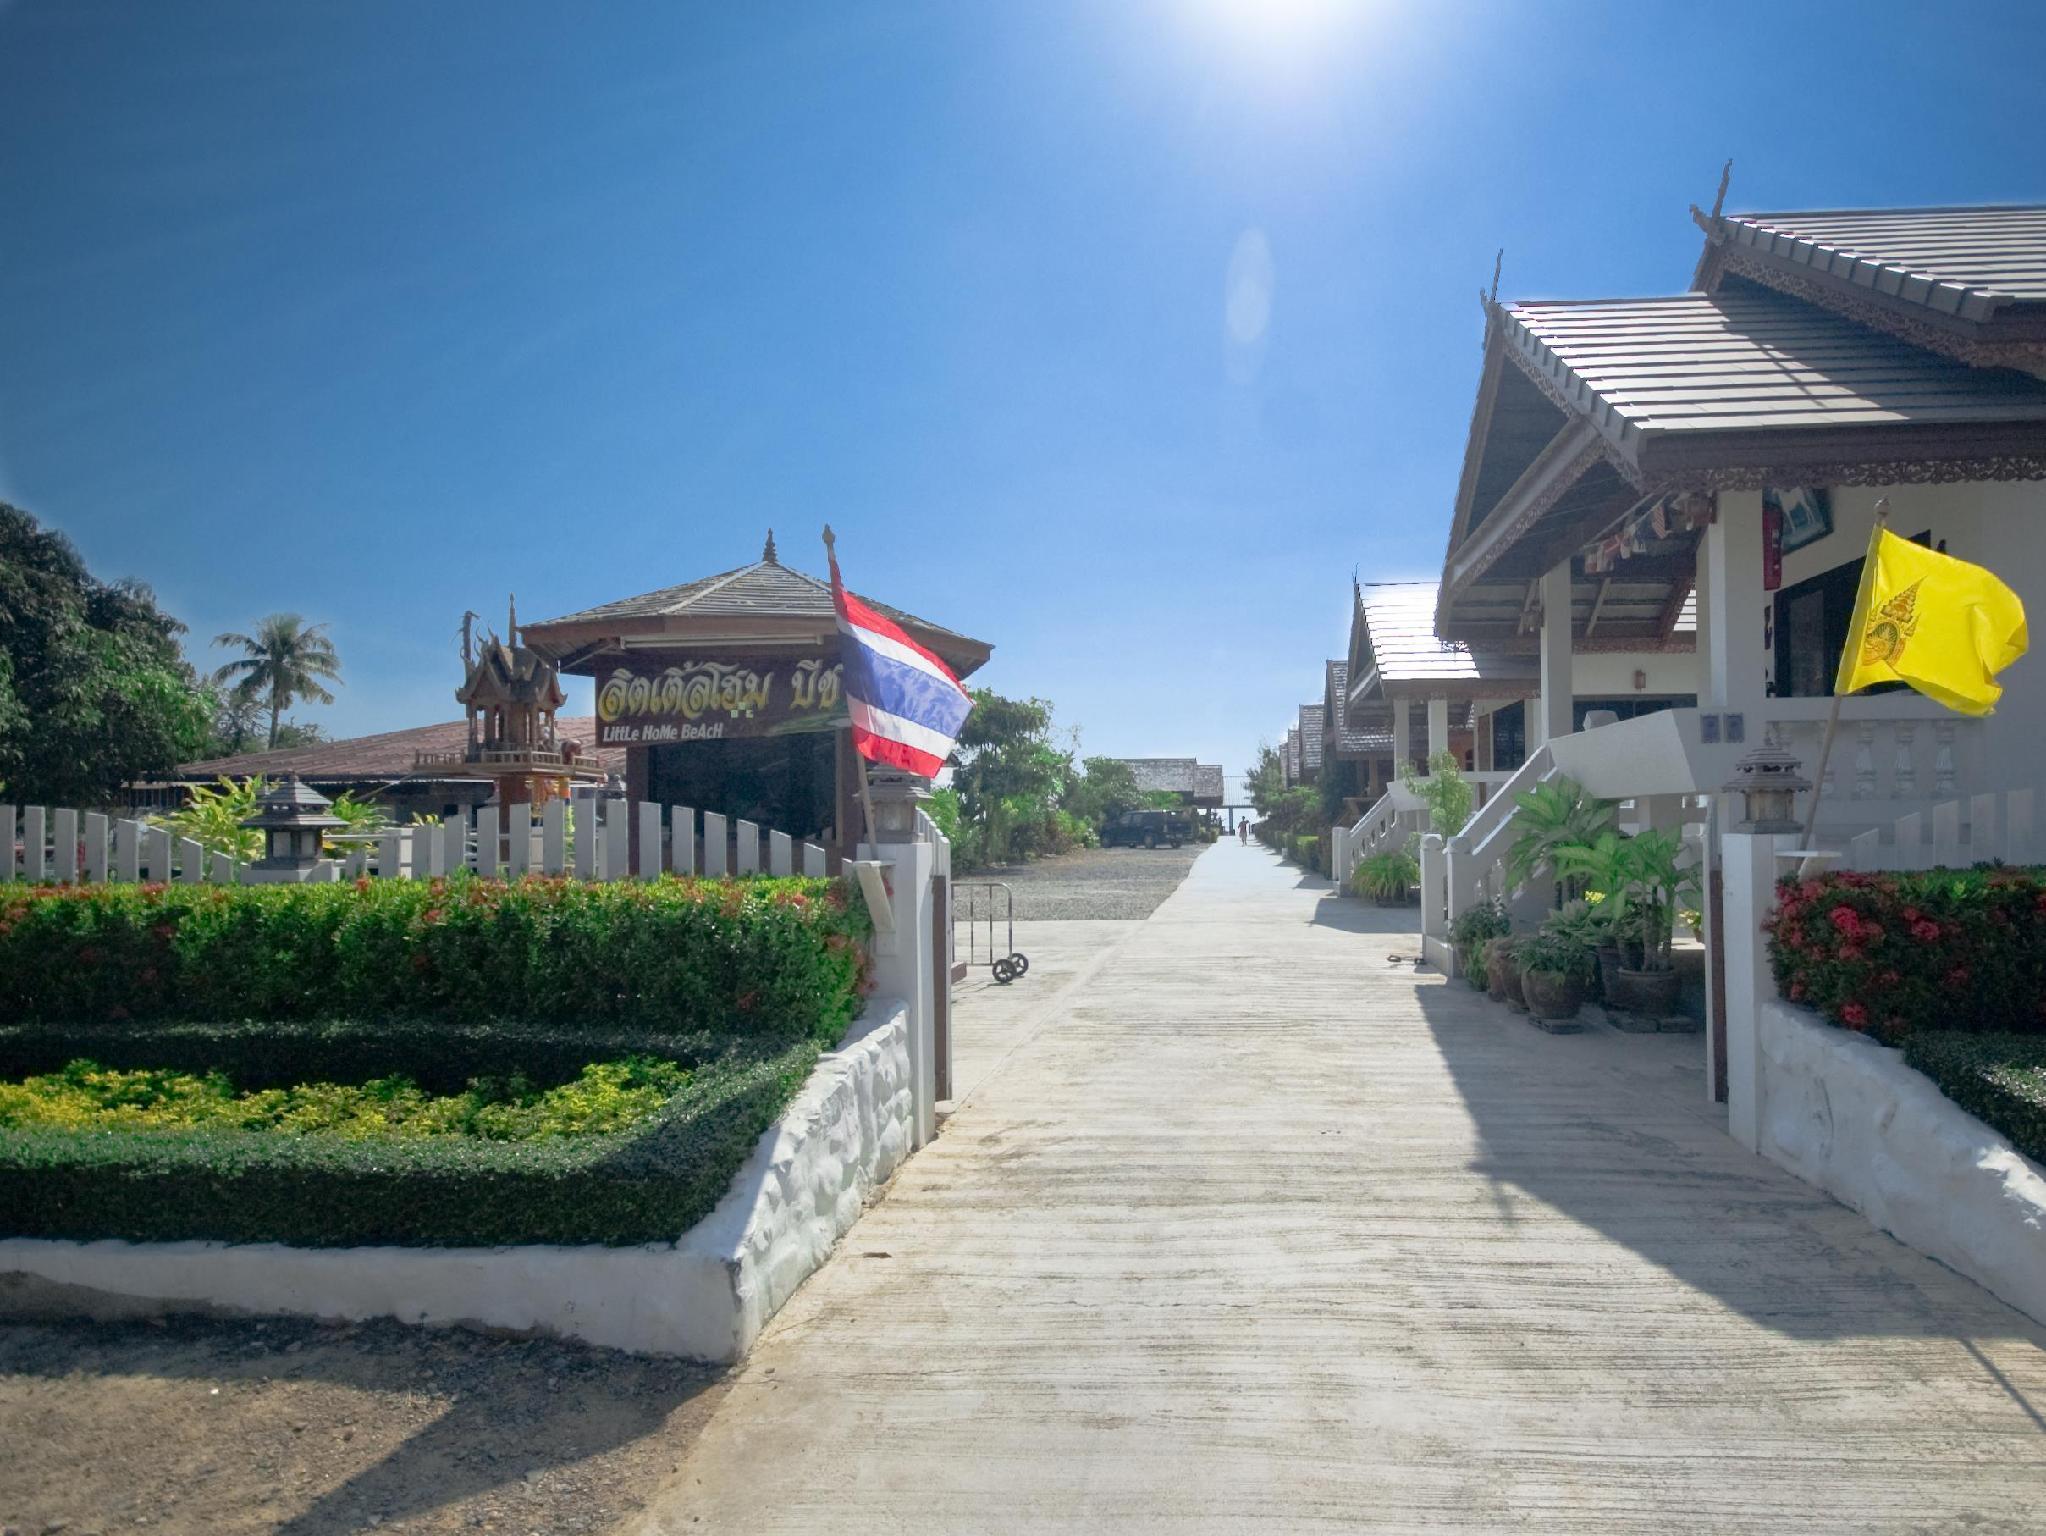 Little Home Beach - Hotell och Boende i Thailand i Asien